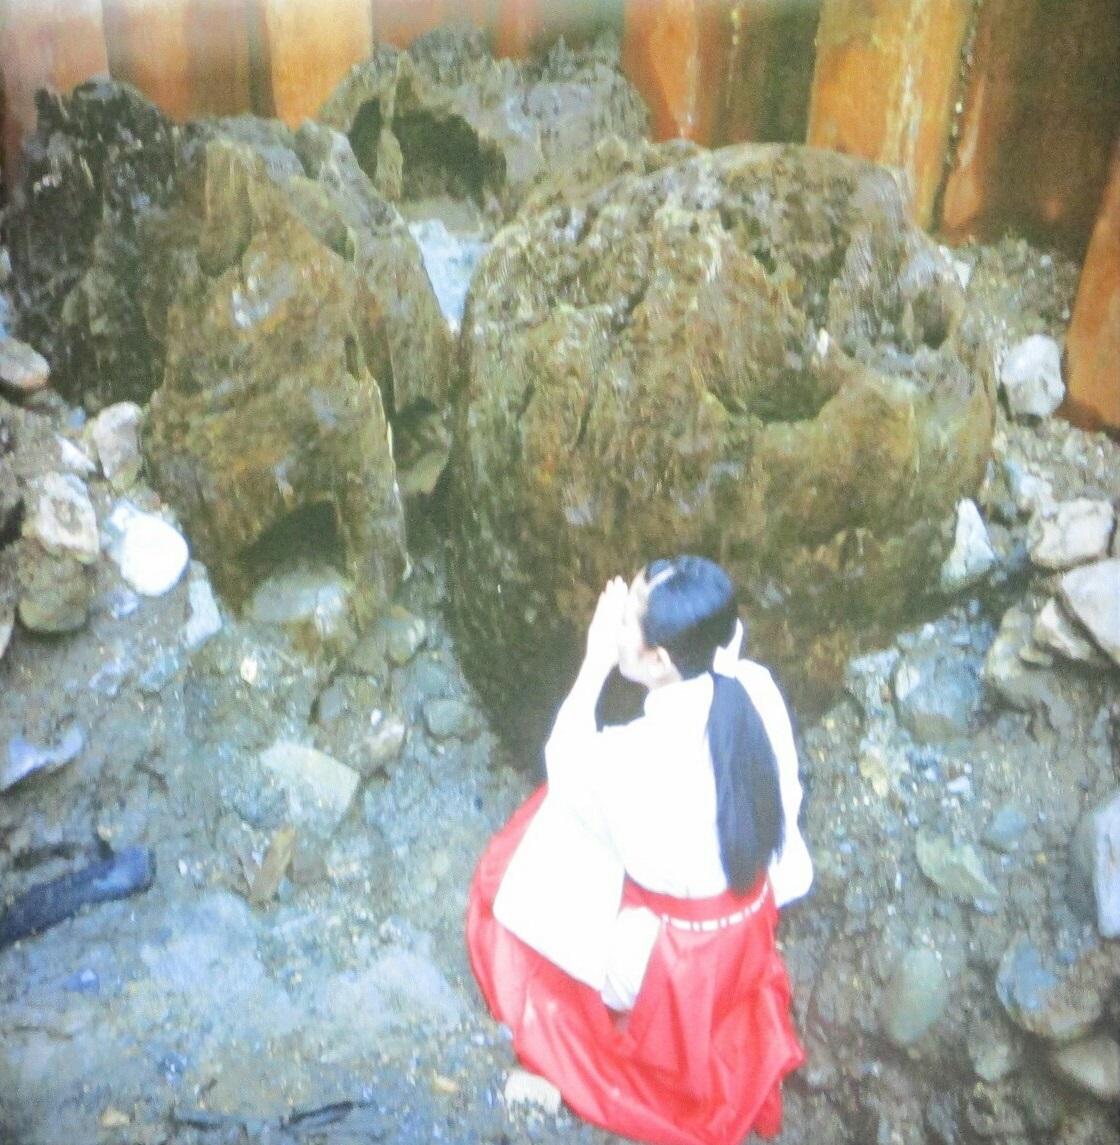 2018.7.6 (118) 宝物殿 - 心御柱の映像 1120-1145